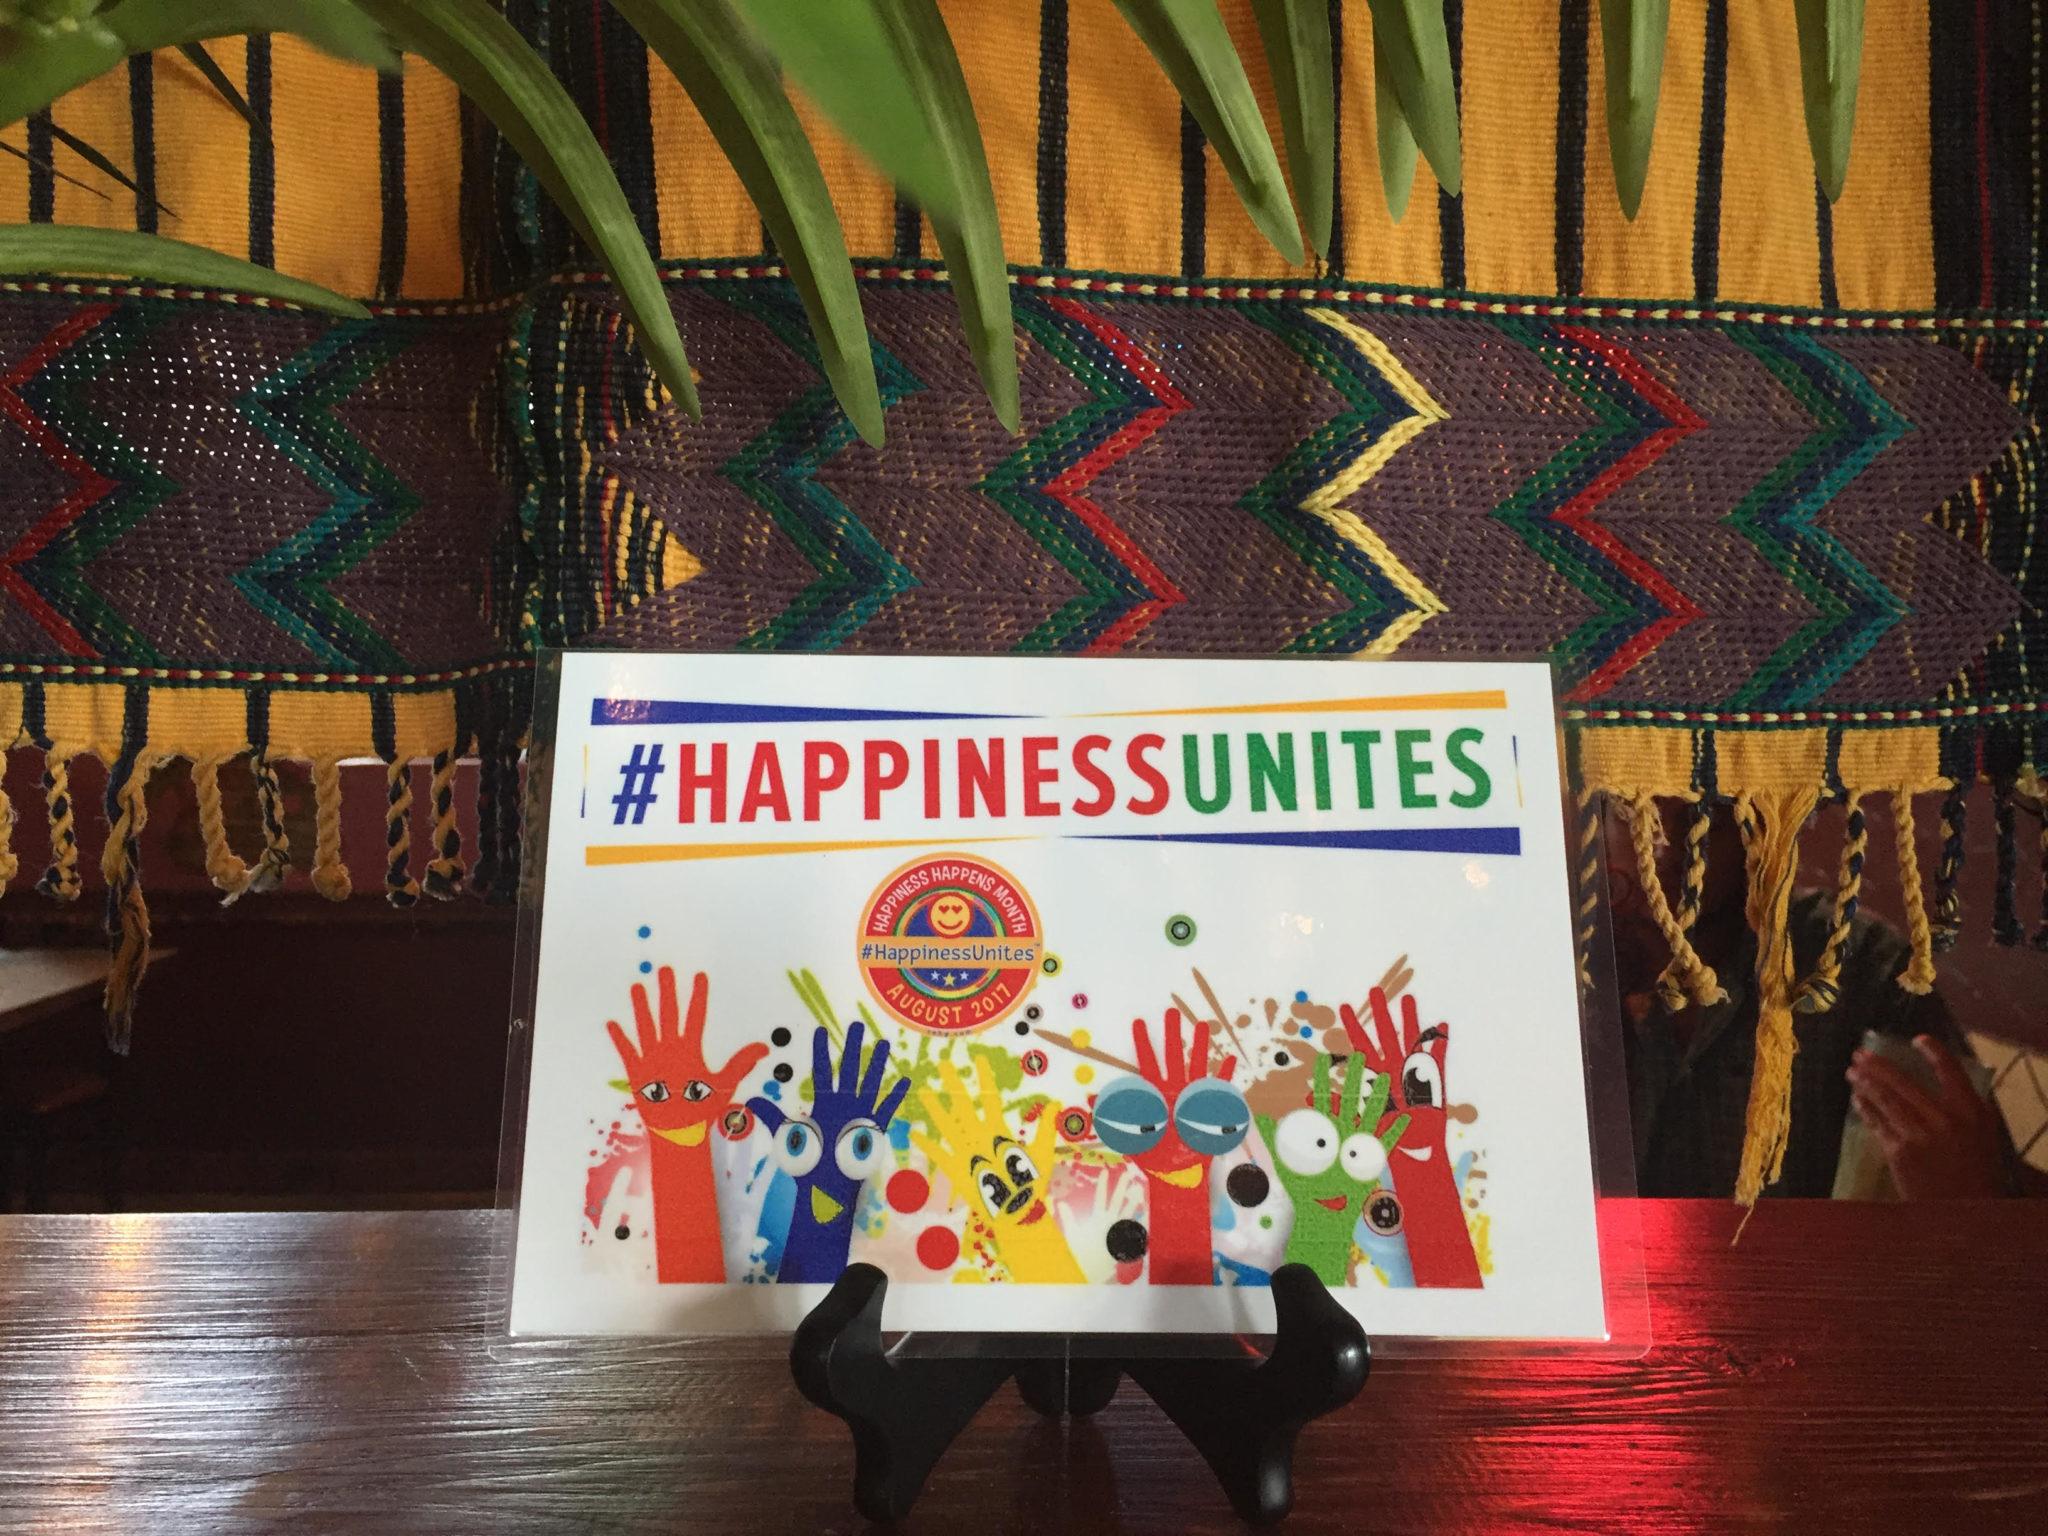 HappinessUnites Tour Amarillo, Happiness Happens Month, #HappinessUnites, Secret Society of Happy People, SOHP.com, Pamela Gail Johnson, Amarillo TX,